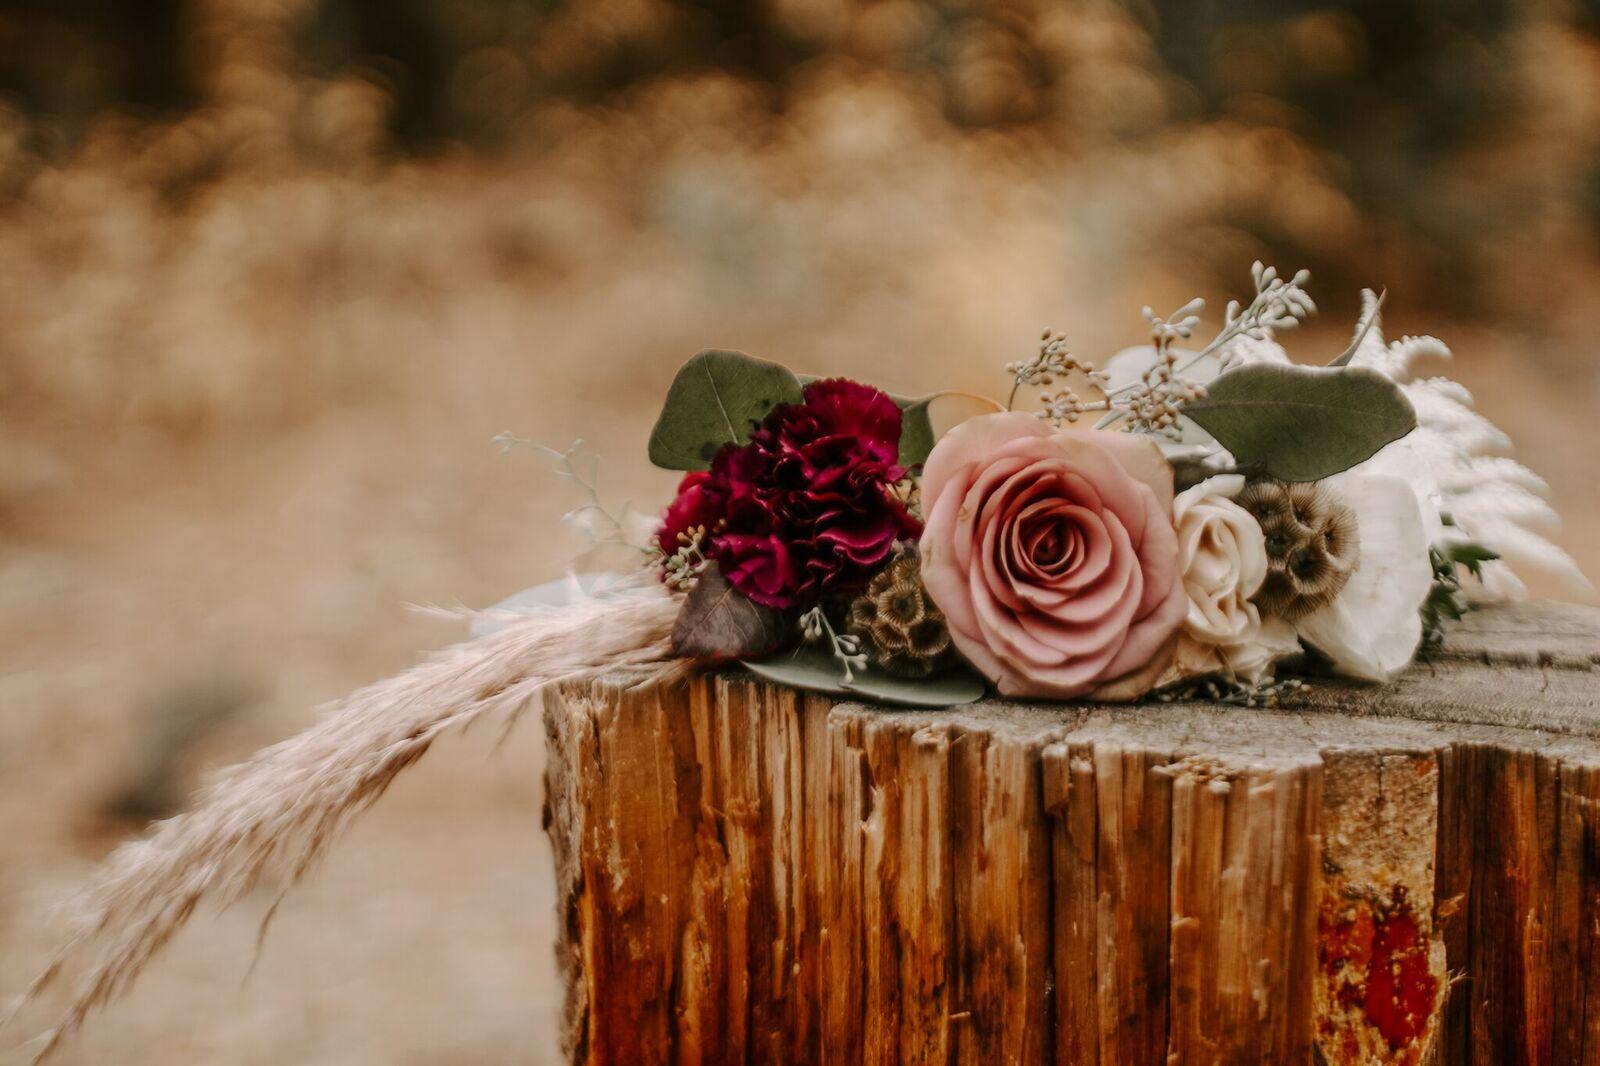 spokane river wedding photo shoot image2